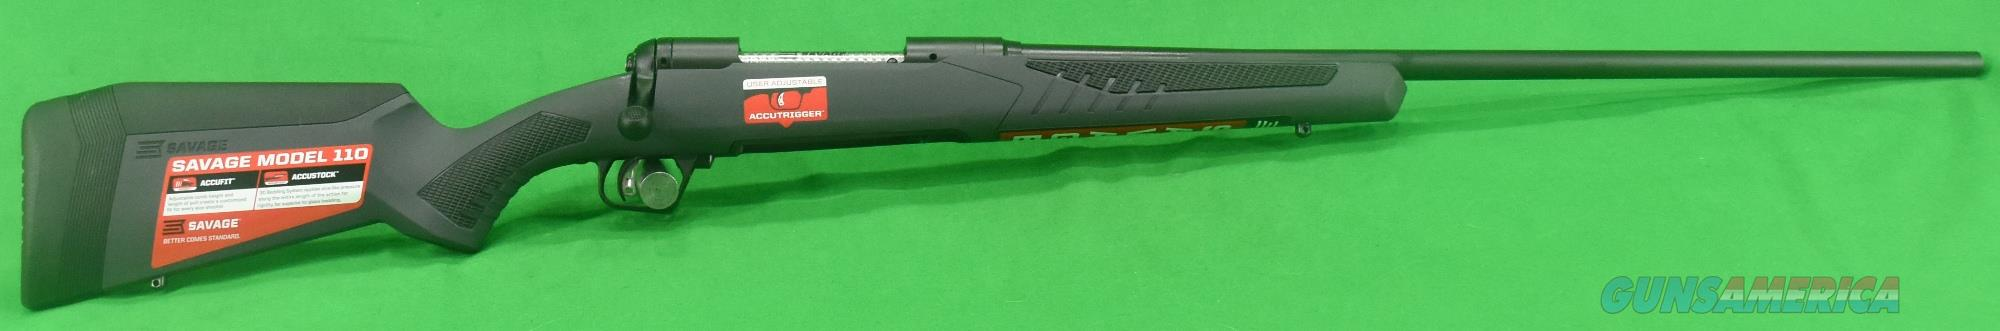 110 Hunter Gray Syn 300Win 24In  57042  Guns > Rifles > Savage Rifles > 10/110